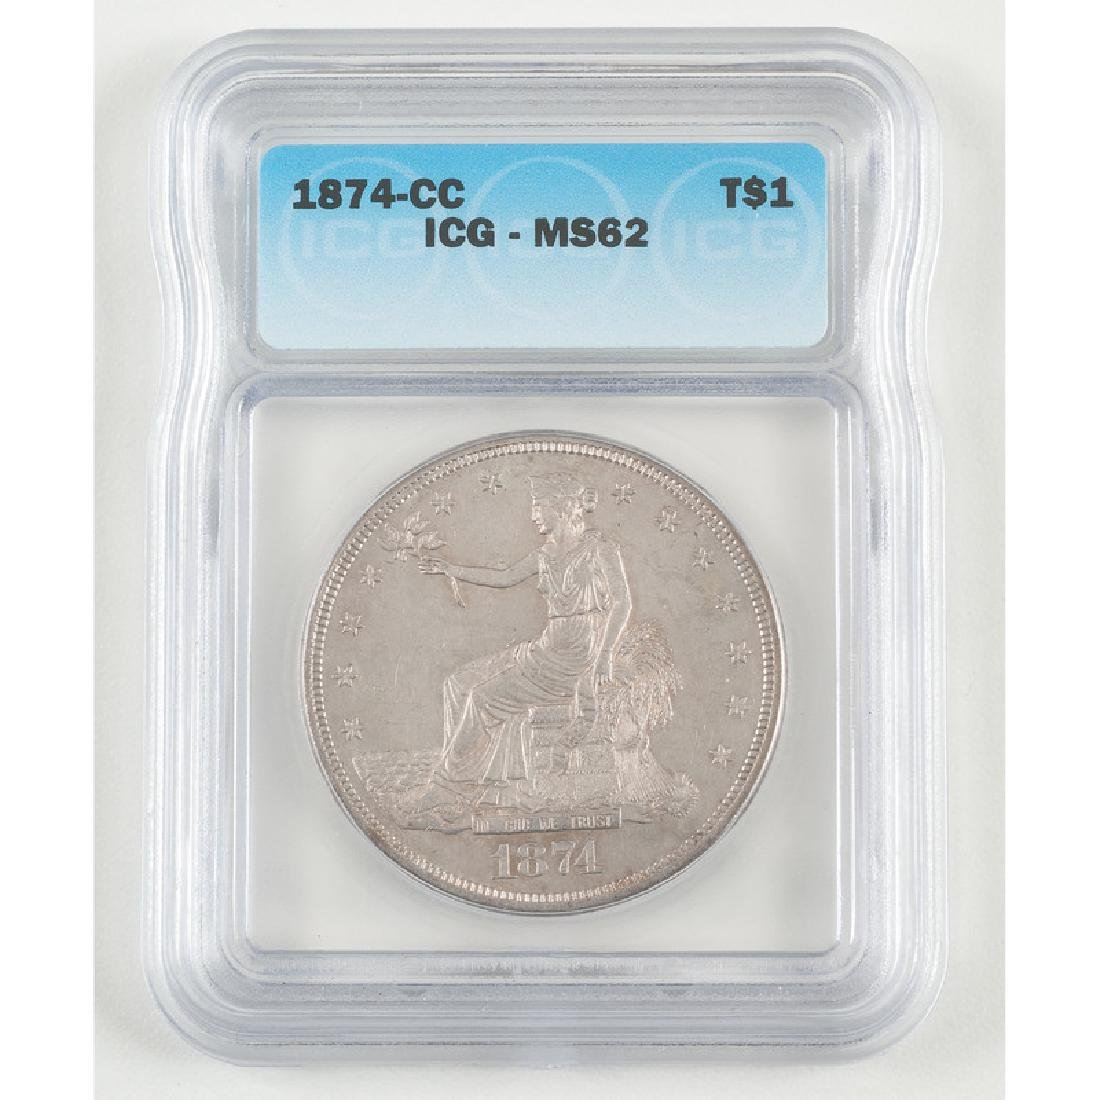 United States Trade Dollar 1874-CC, ICG MS62